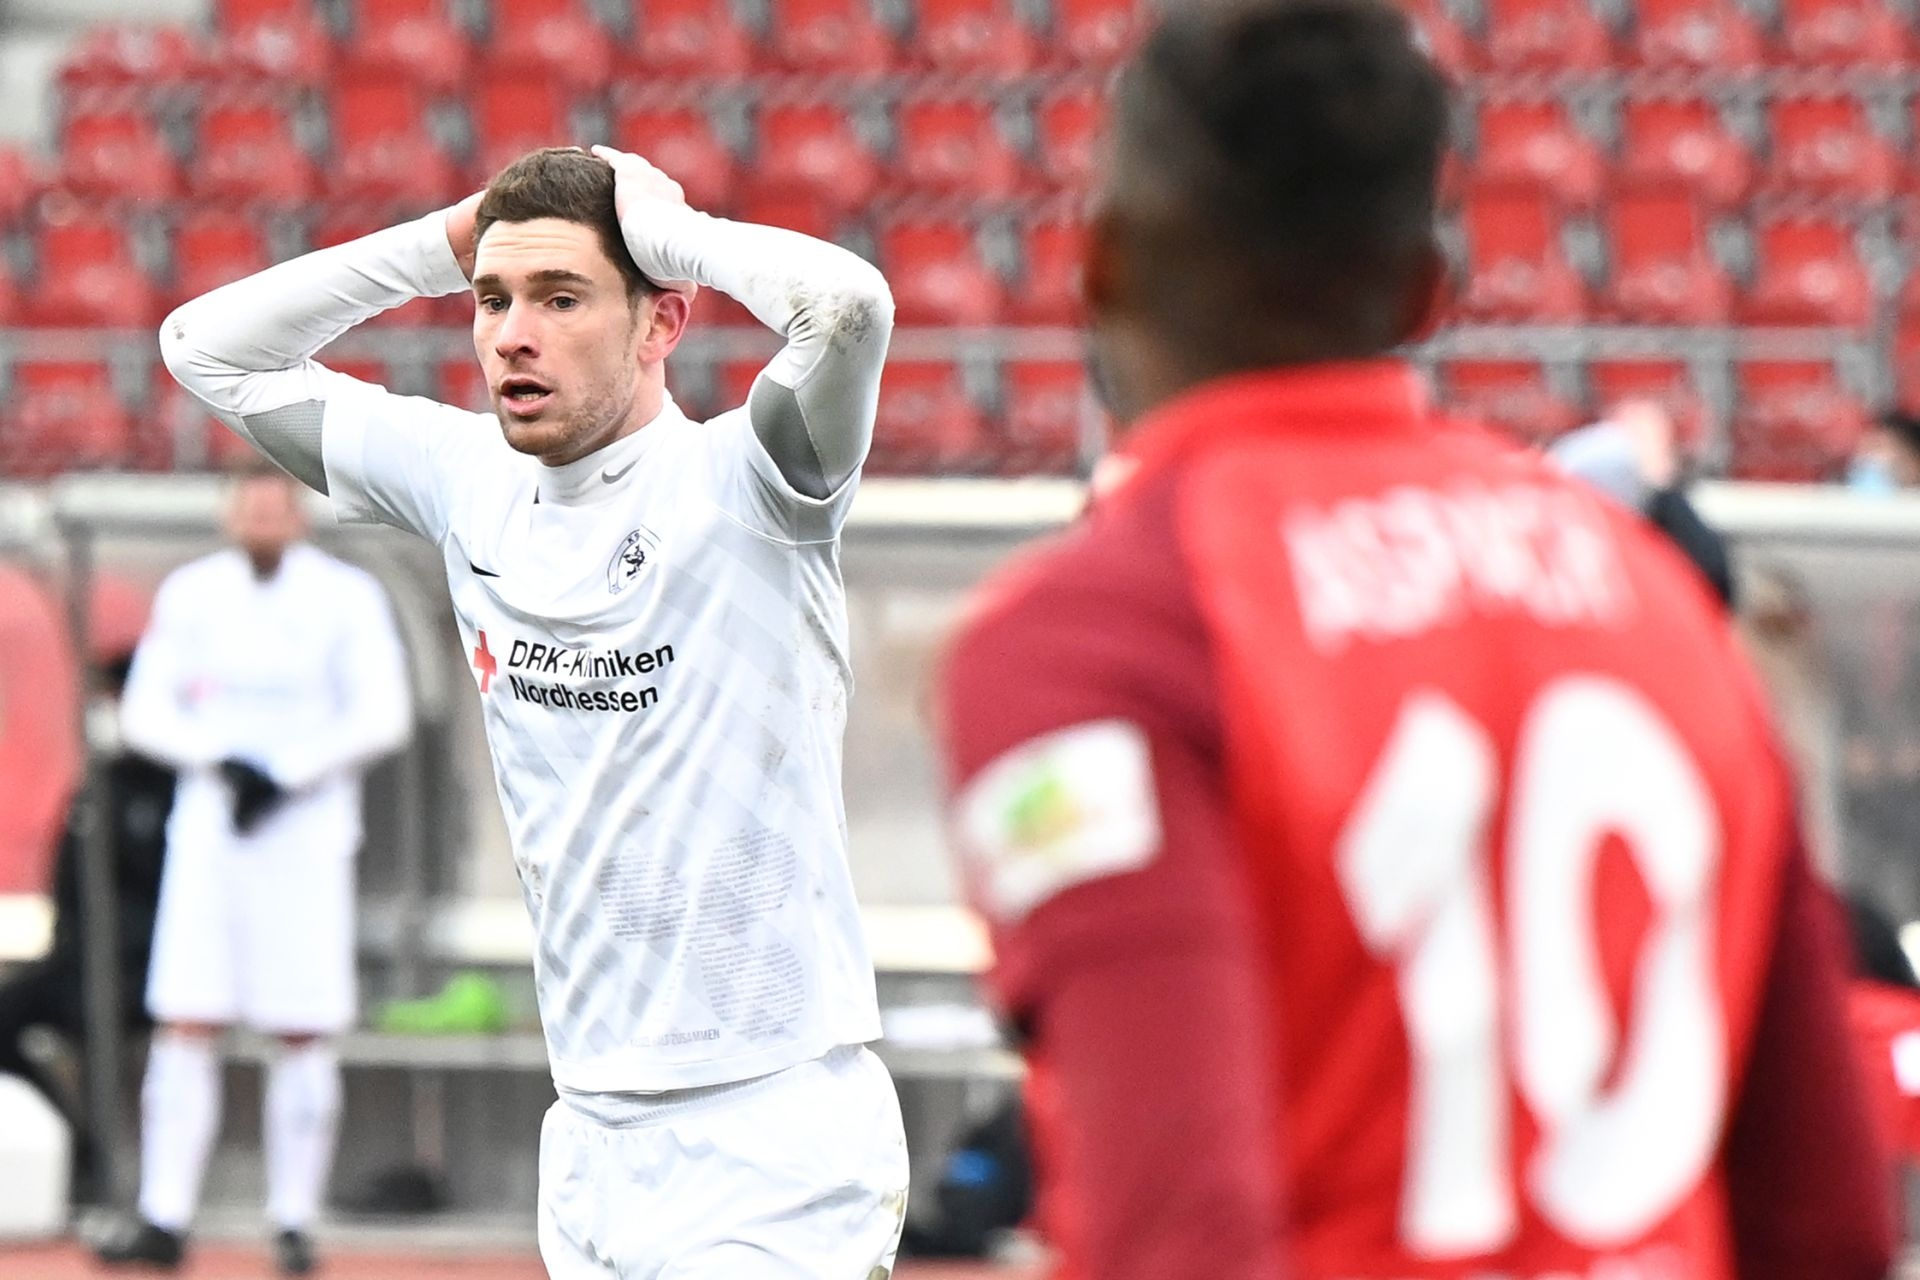 Regionalliga S�dwest 2020/21, KSV Hessen Kassel, SG Sonnenhof Grossaspach, Endstand 0:2, Lukas Iksal